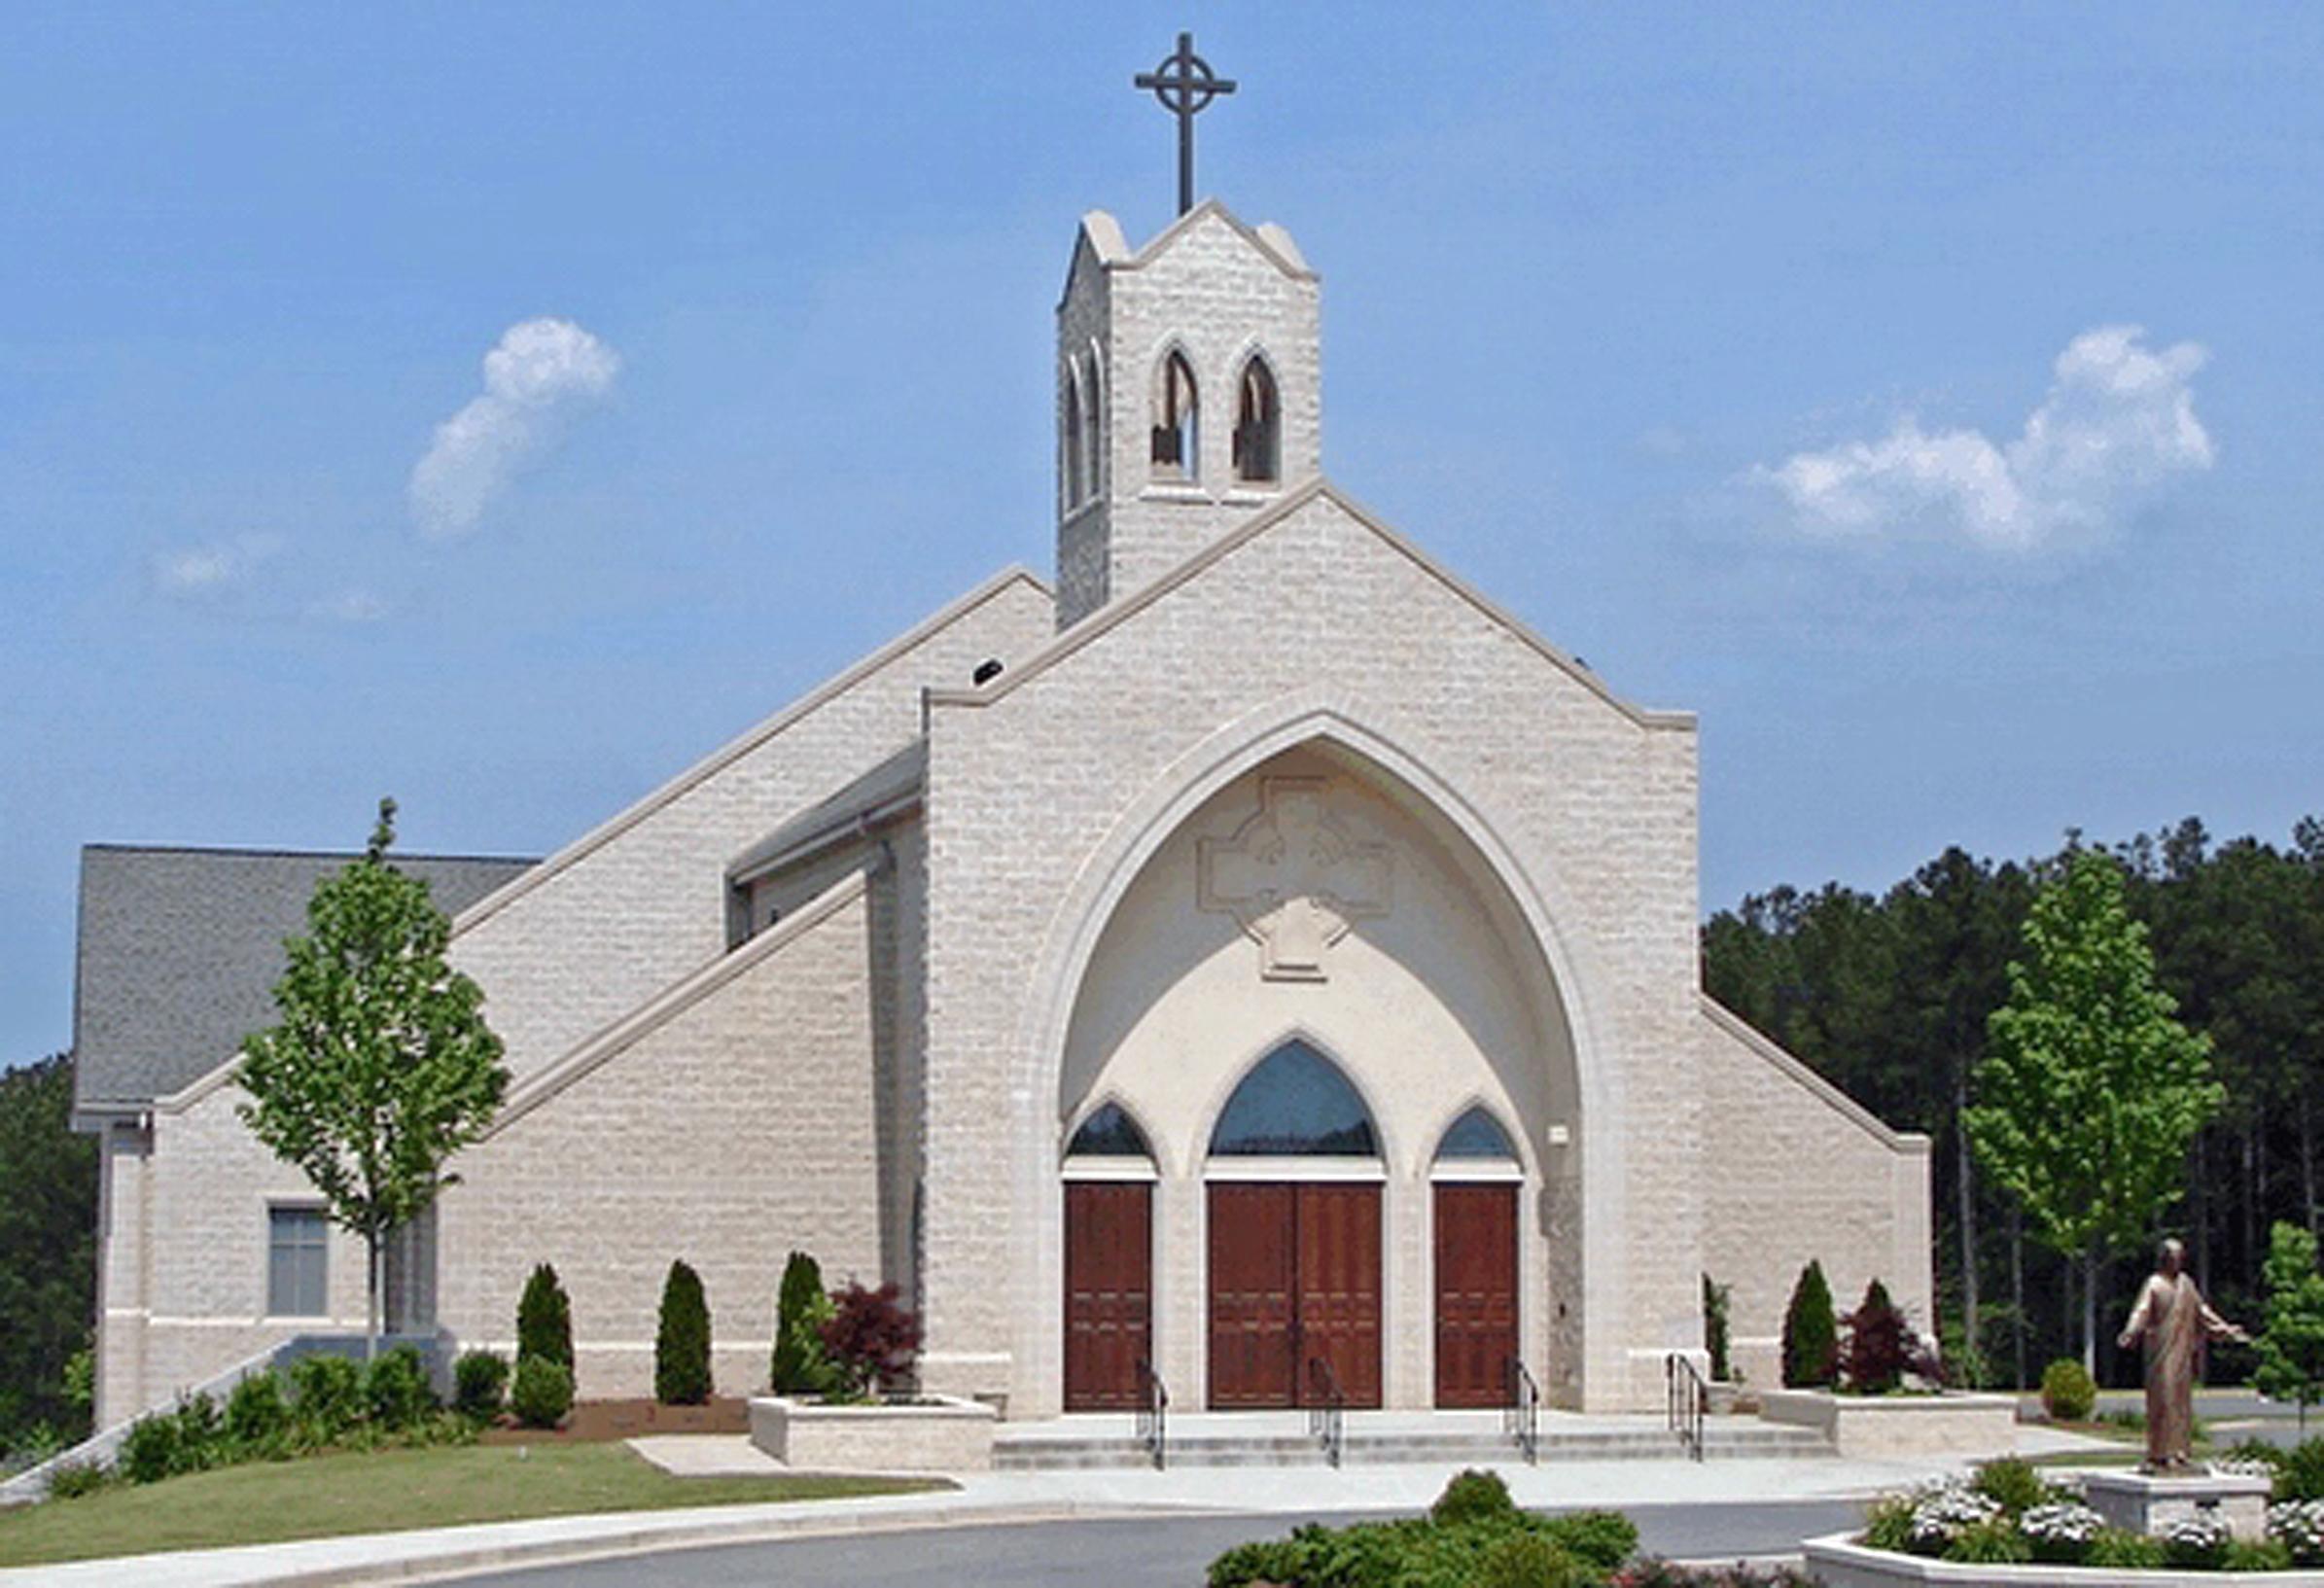 Christ our King Catholic Church